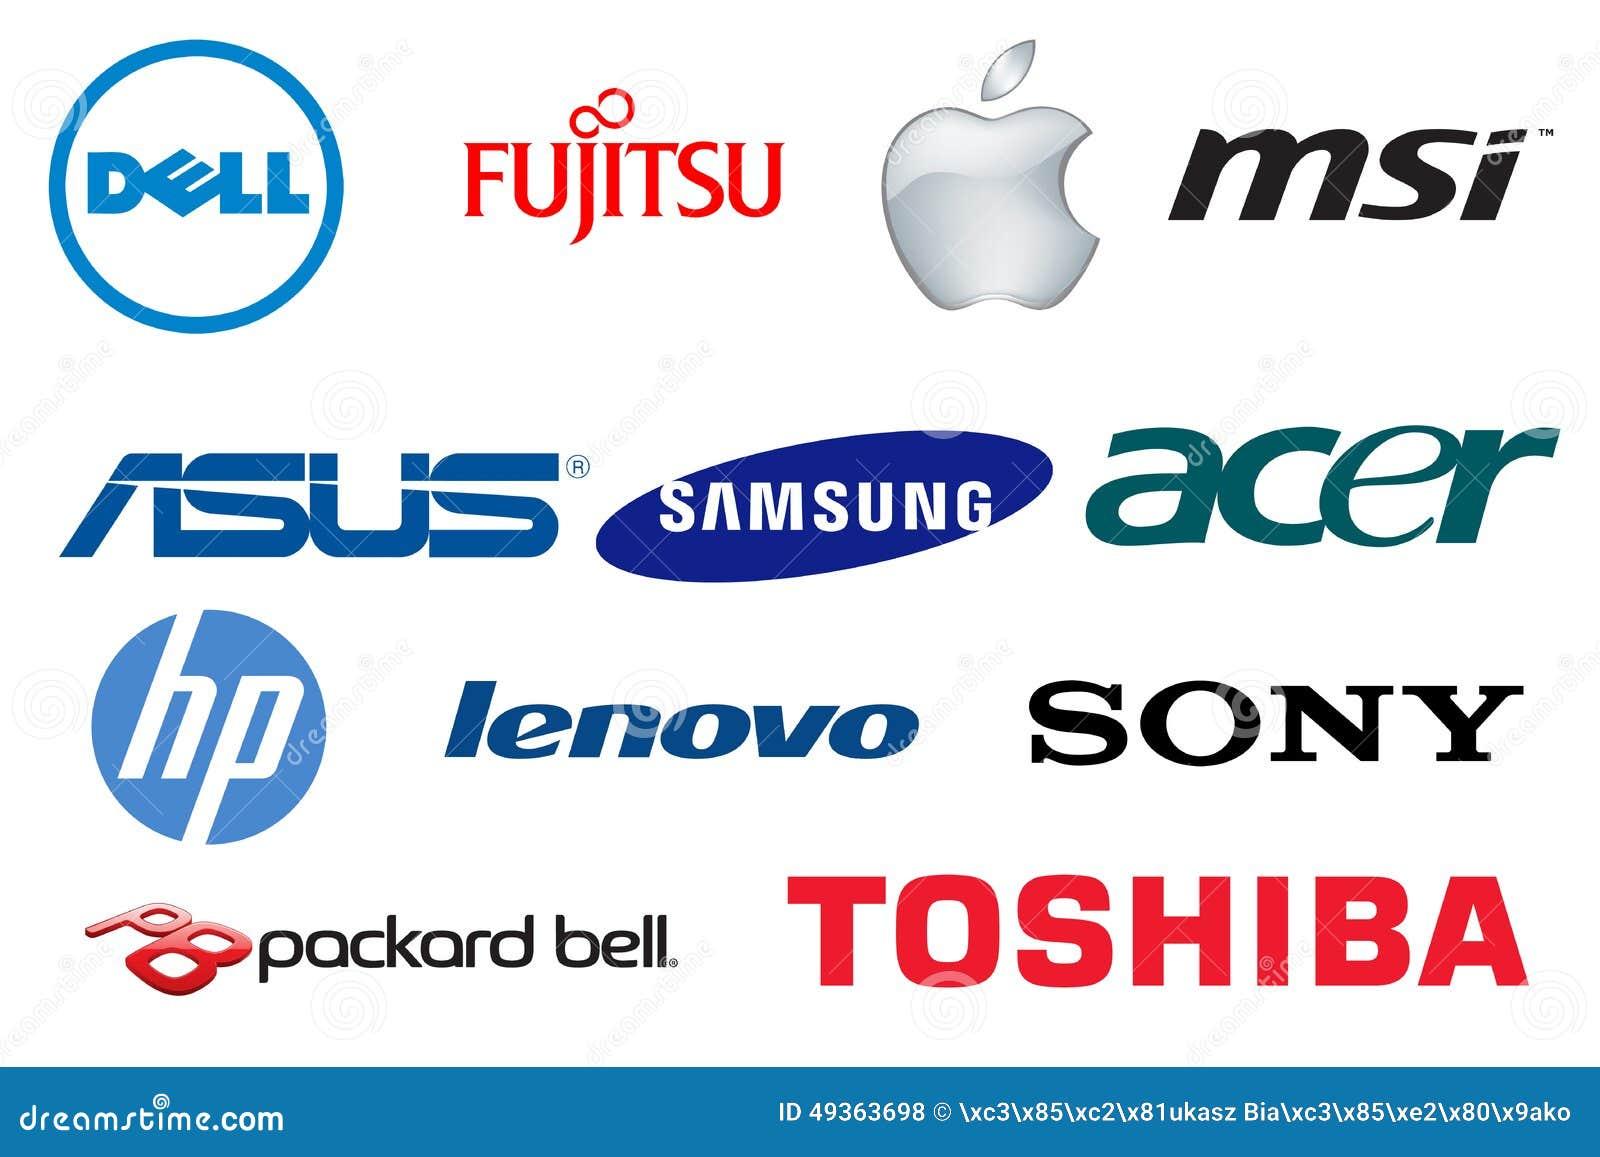 Royalty Free Stock Photos: Brand Laptops Logos. Image: 49363698